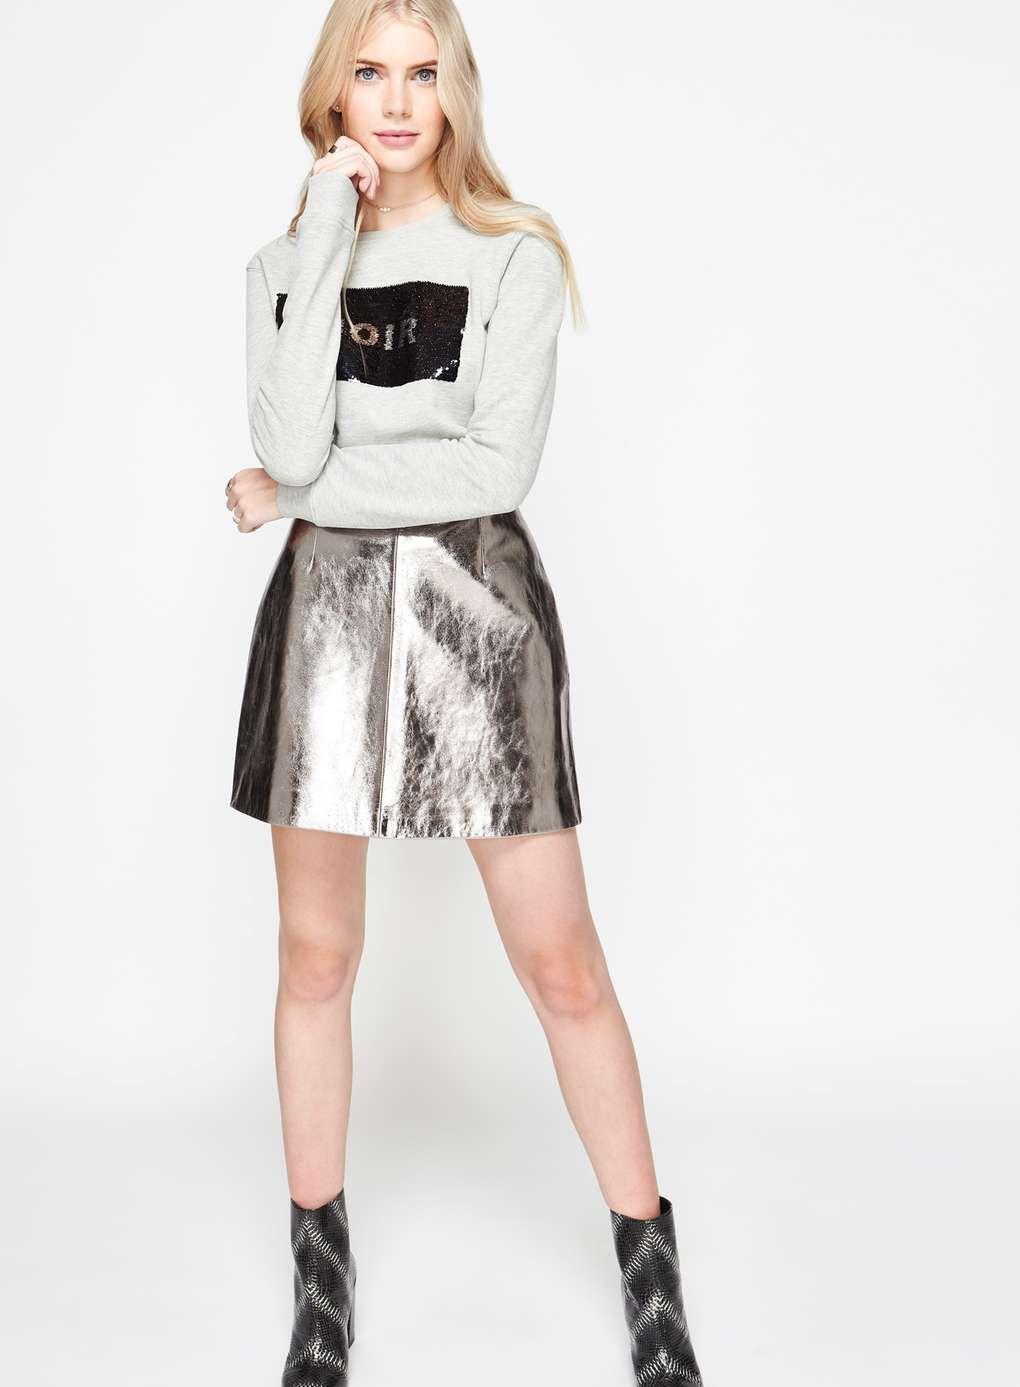 d9e91eb5cf41 Silver Leather Mini Skirt - Miss Selfridge Leather Mini Skirts, Carousel, Miss  Selfridge,